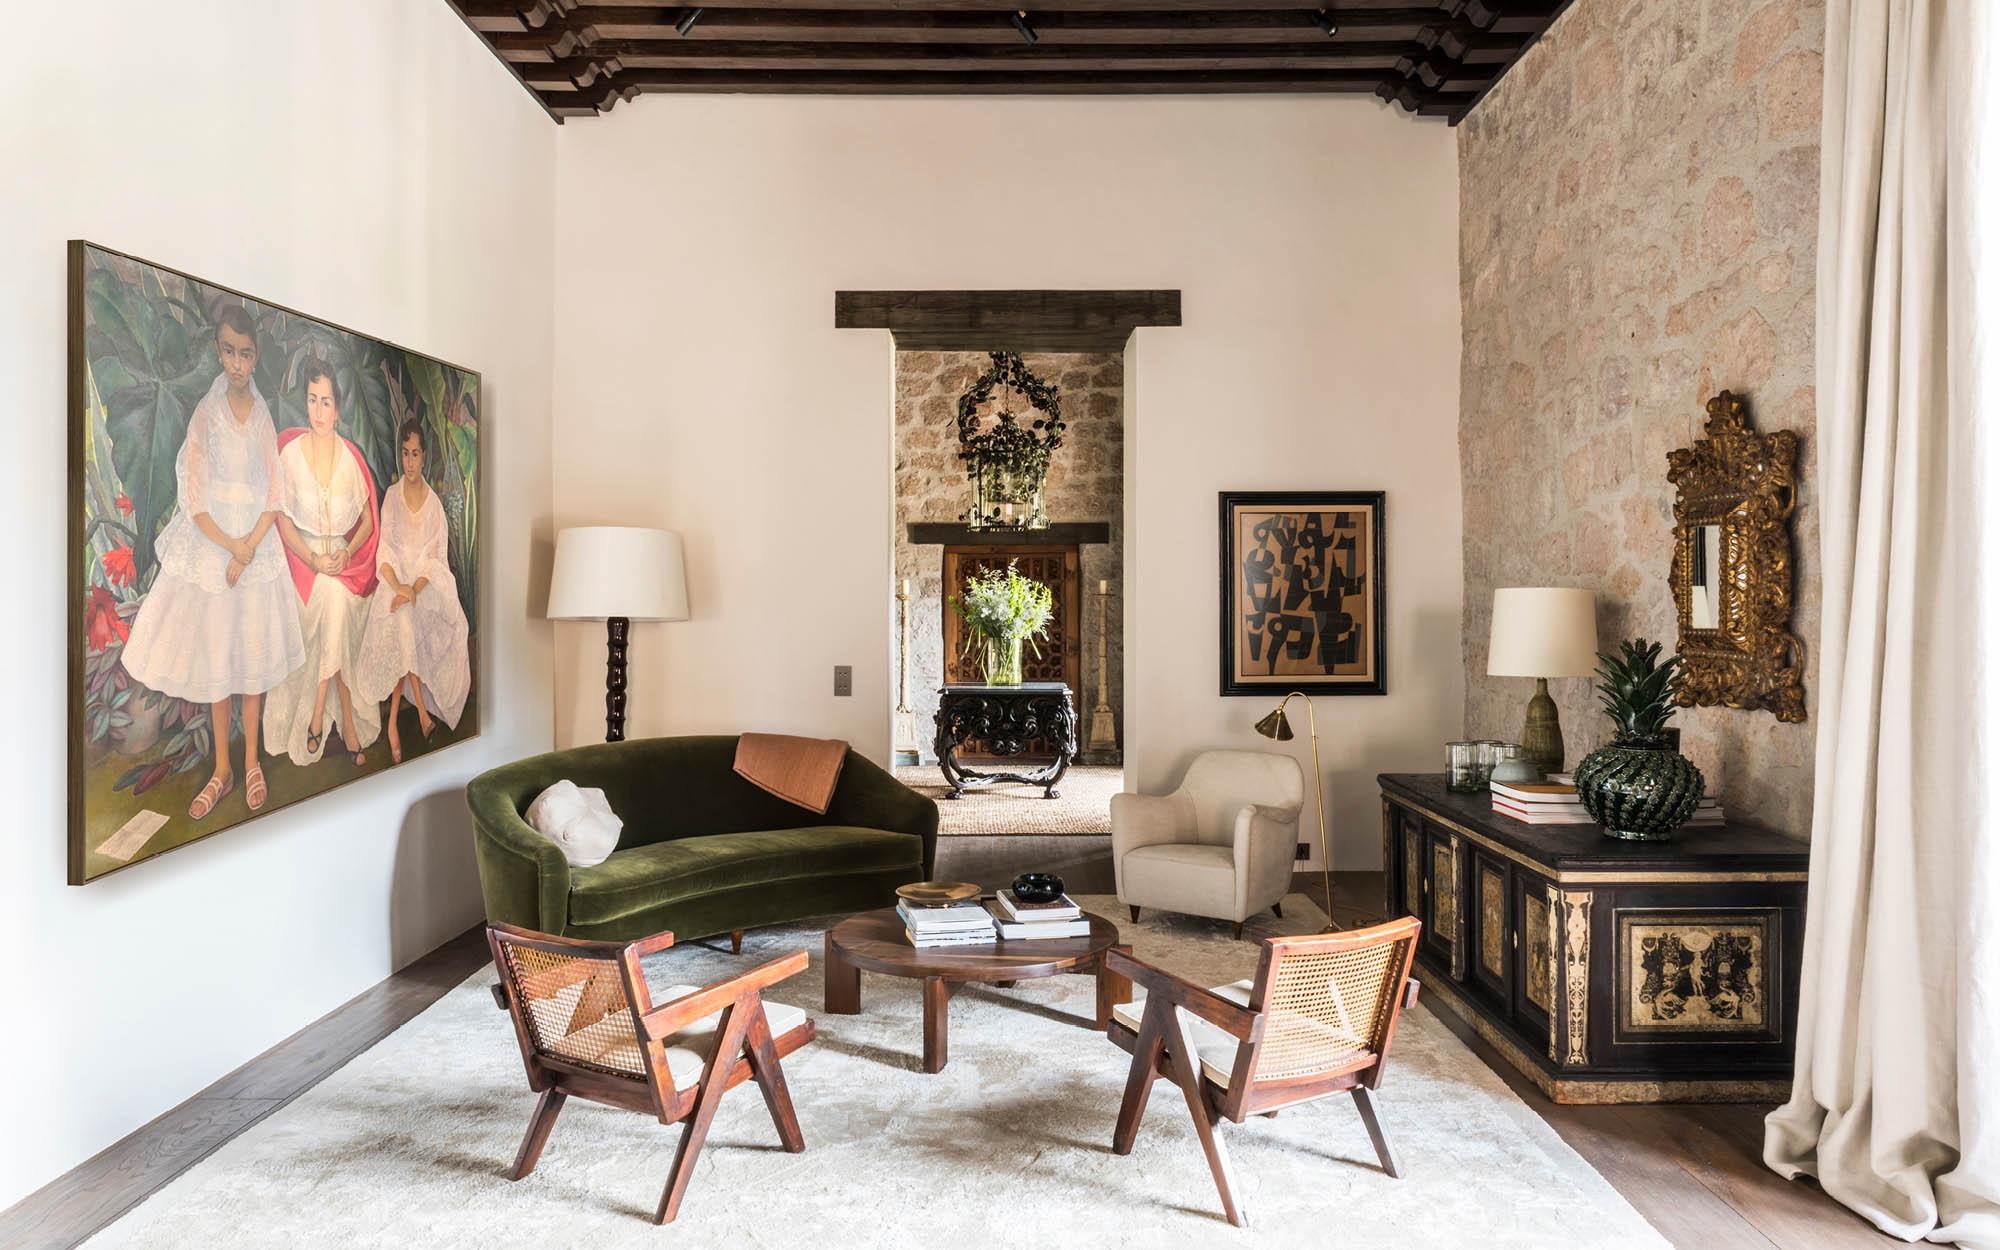 luis_laplace-Casa_Michelena_Morelia-8